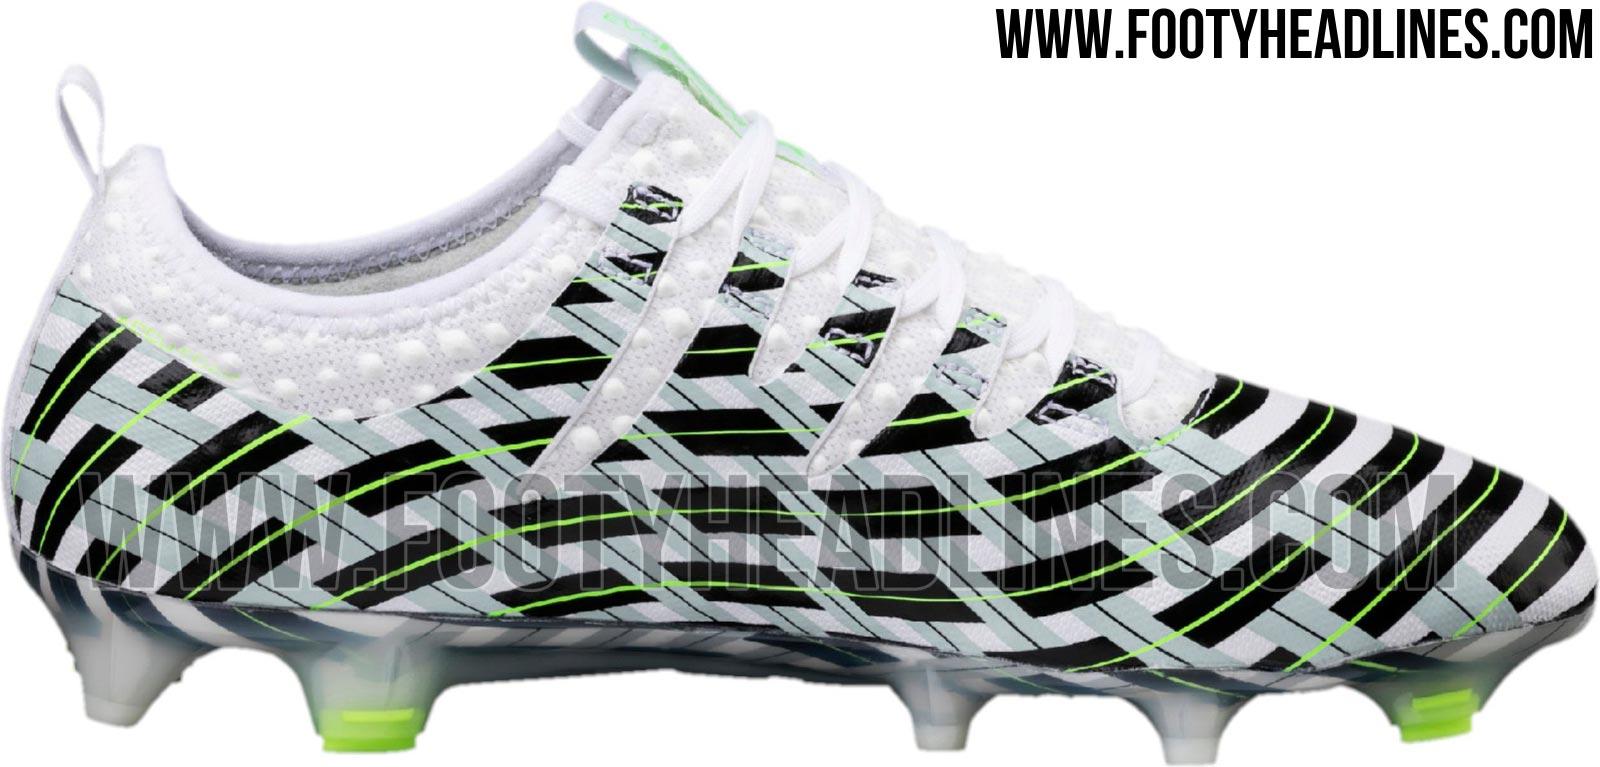 puma 2017 boots